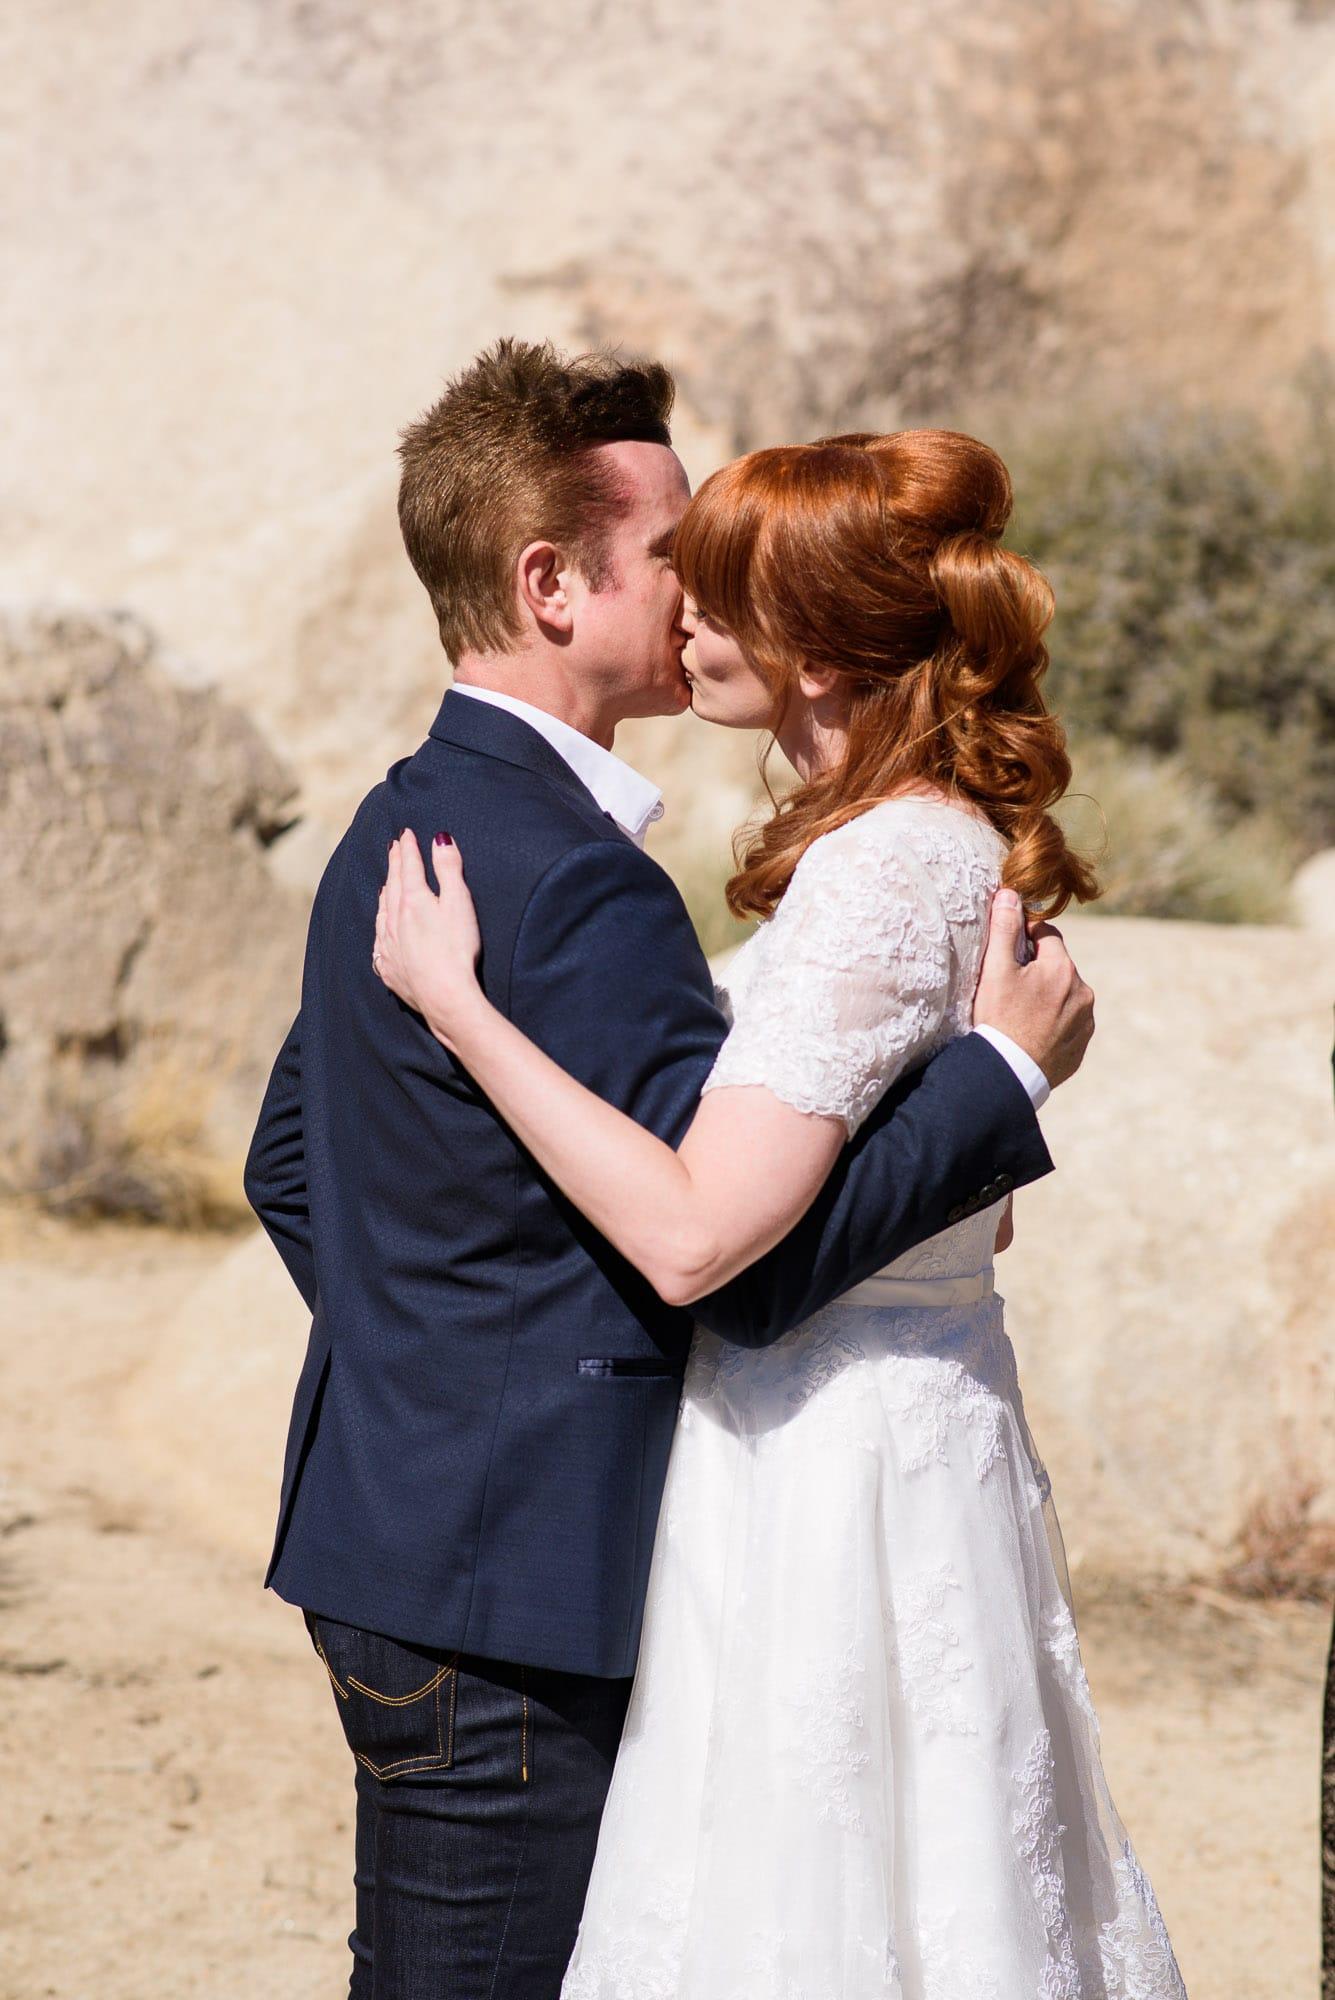 014_Alan_and_Heidi_Joshua_Tree_Destination_Wedding